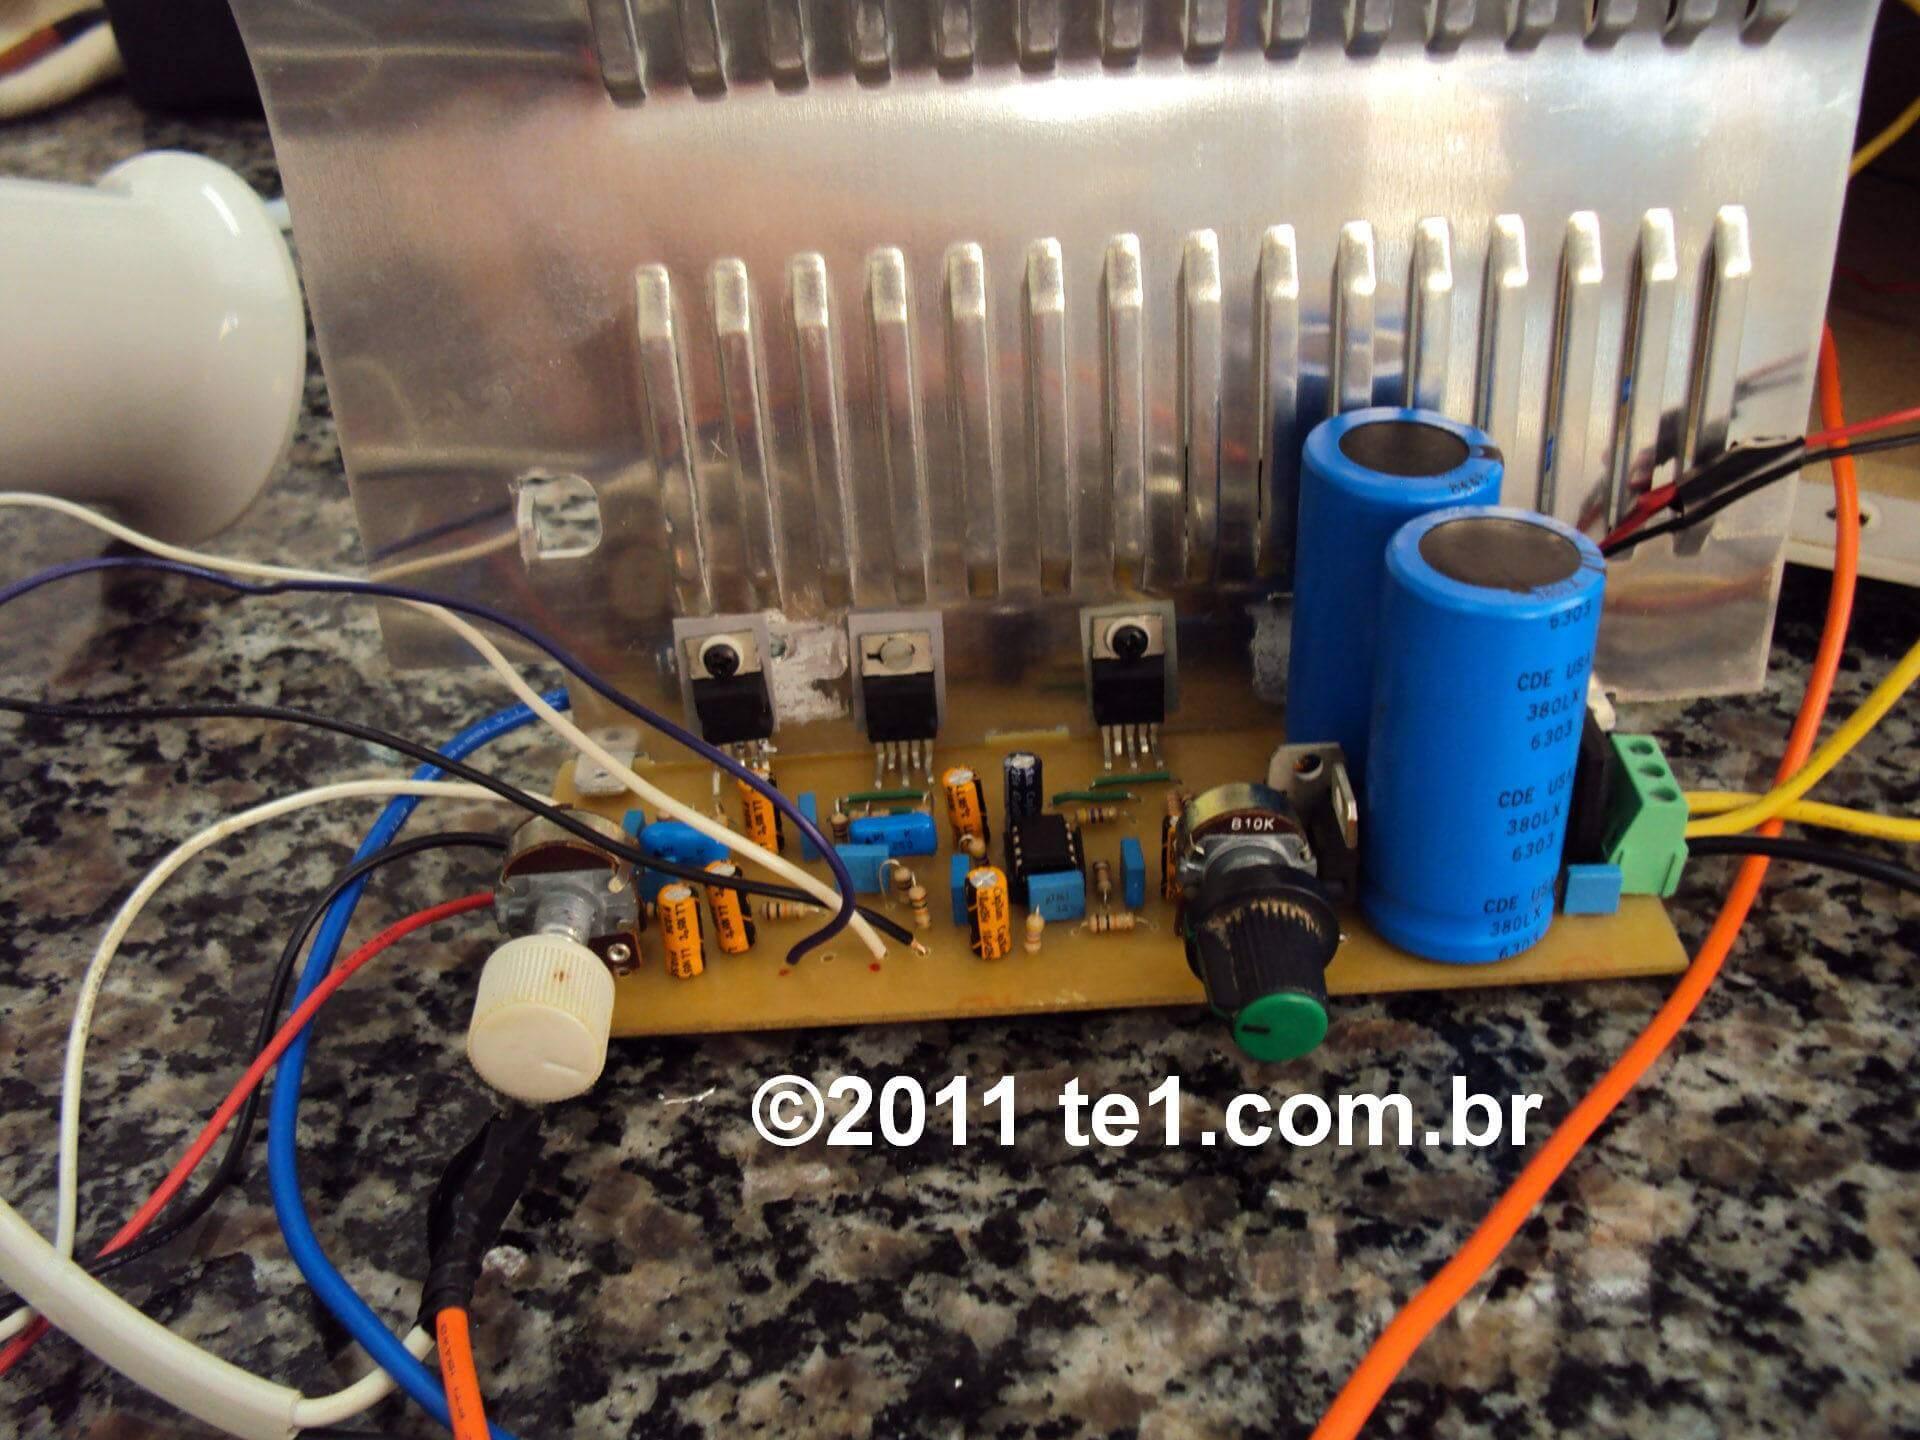 Circuito De Amplificador Udio Com Tda2030 21 3 X 18 Watts 20w Audio Amplifier Circuit Using Tda1552q Subwoofer